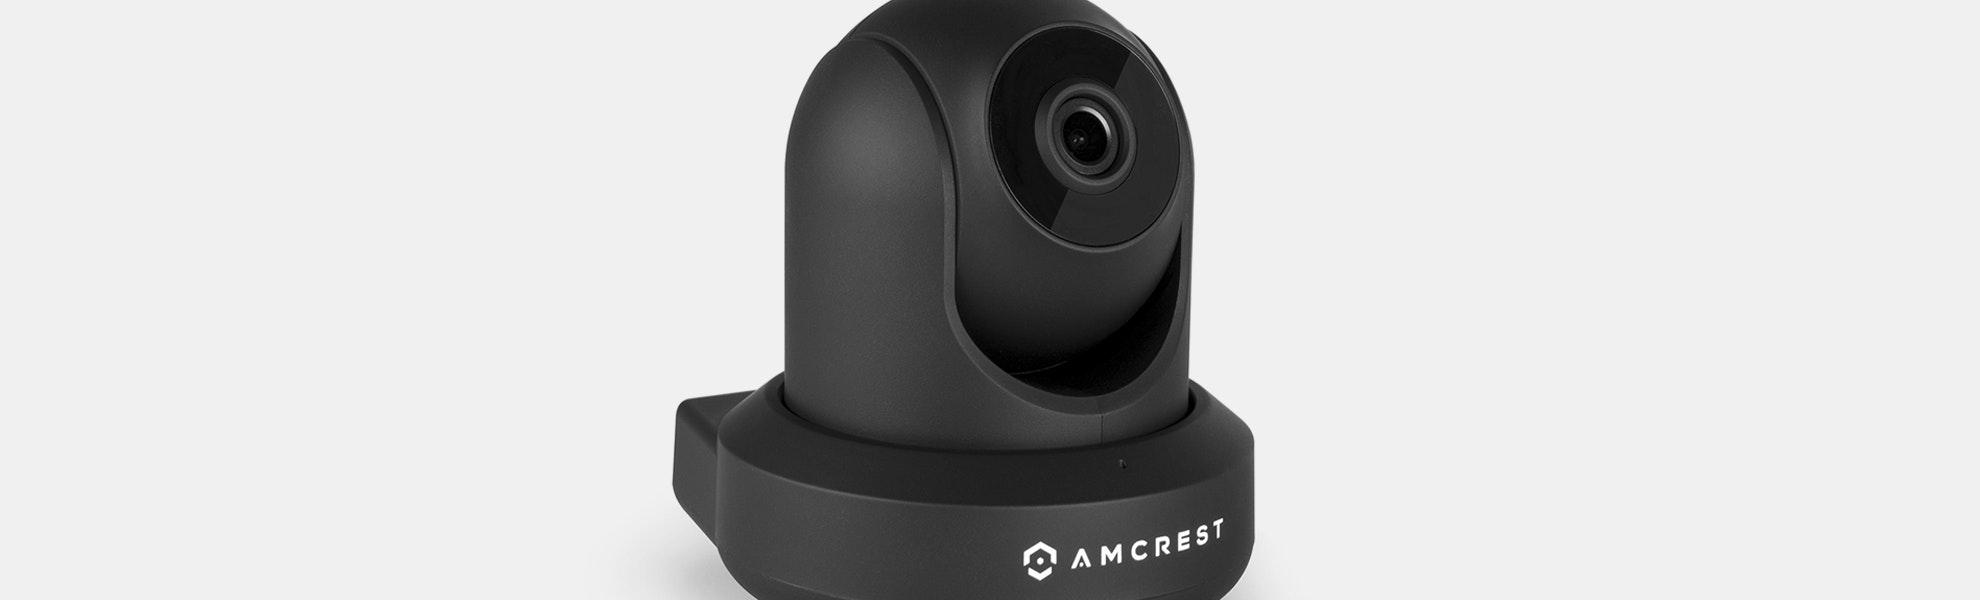 Amcrest 1080p WiFi w/Audio & Night Vision Camera